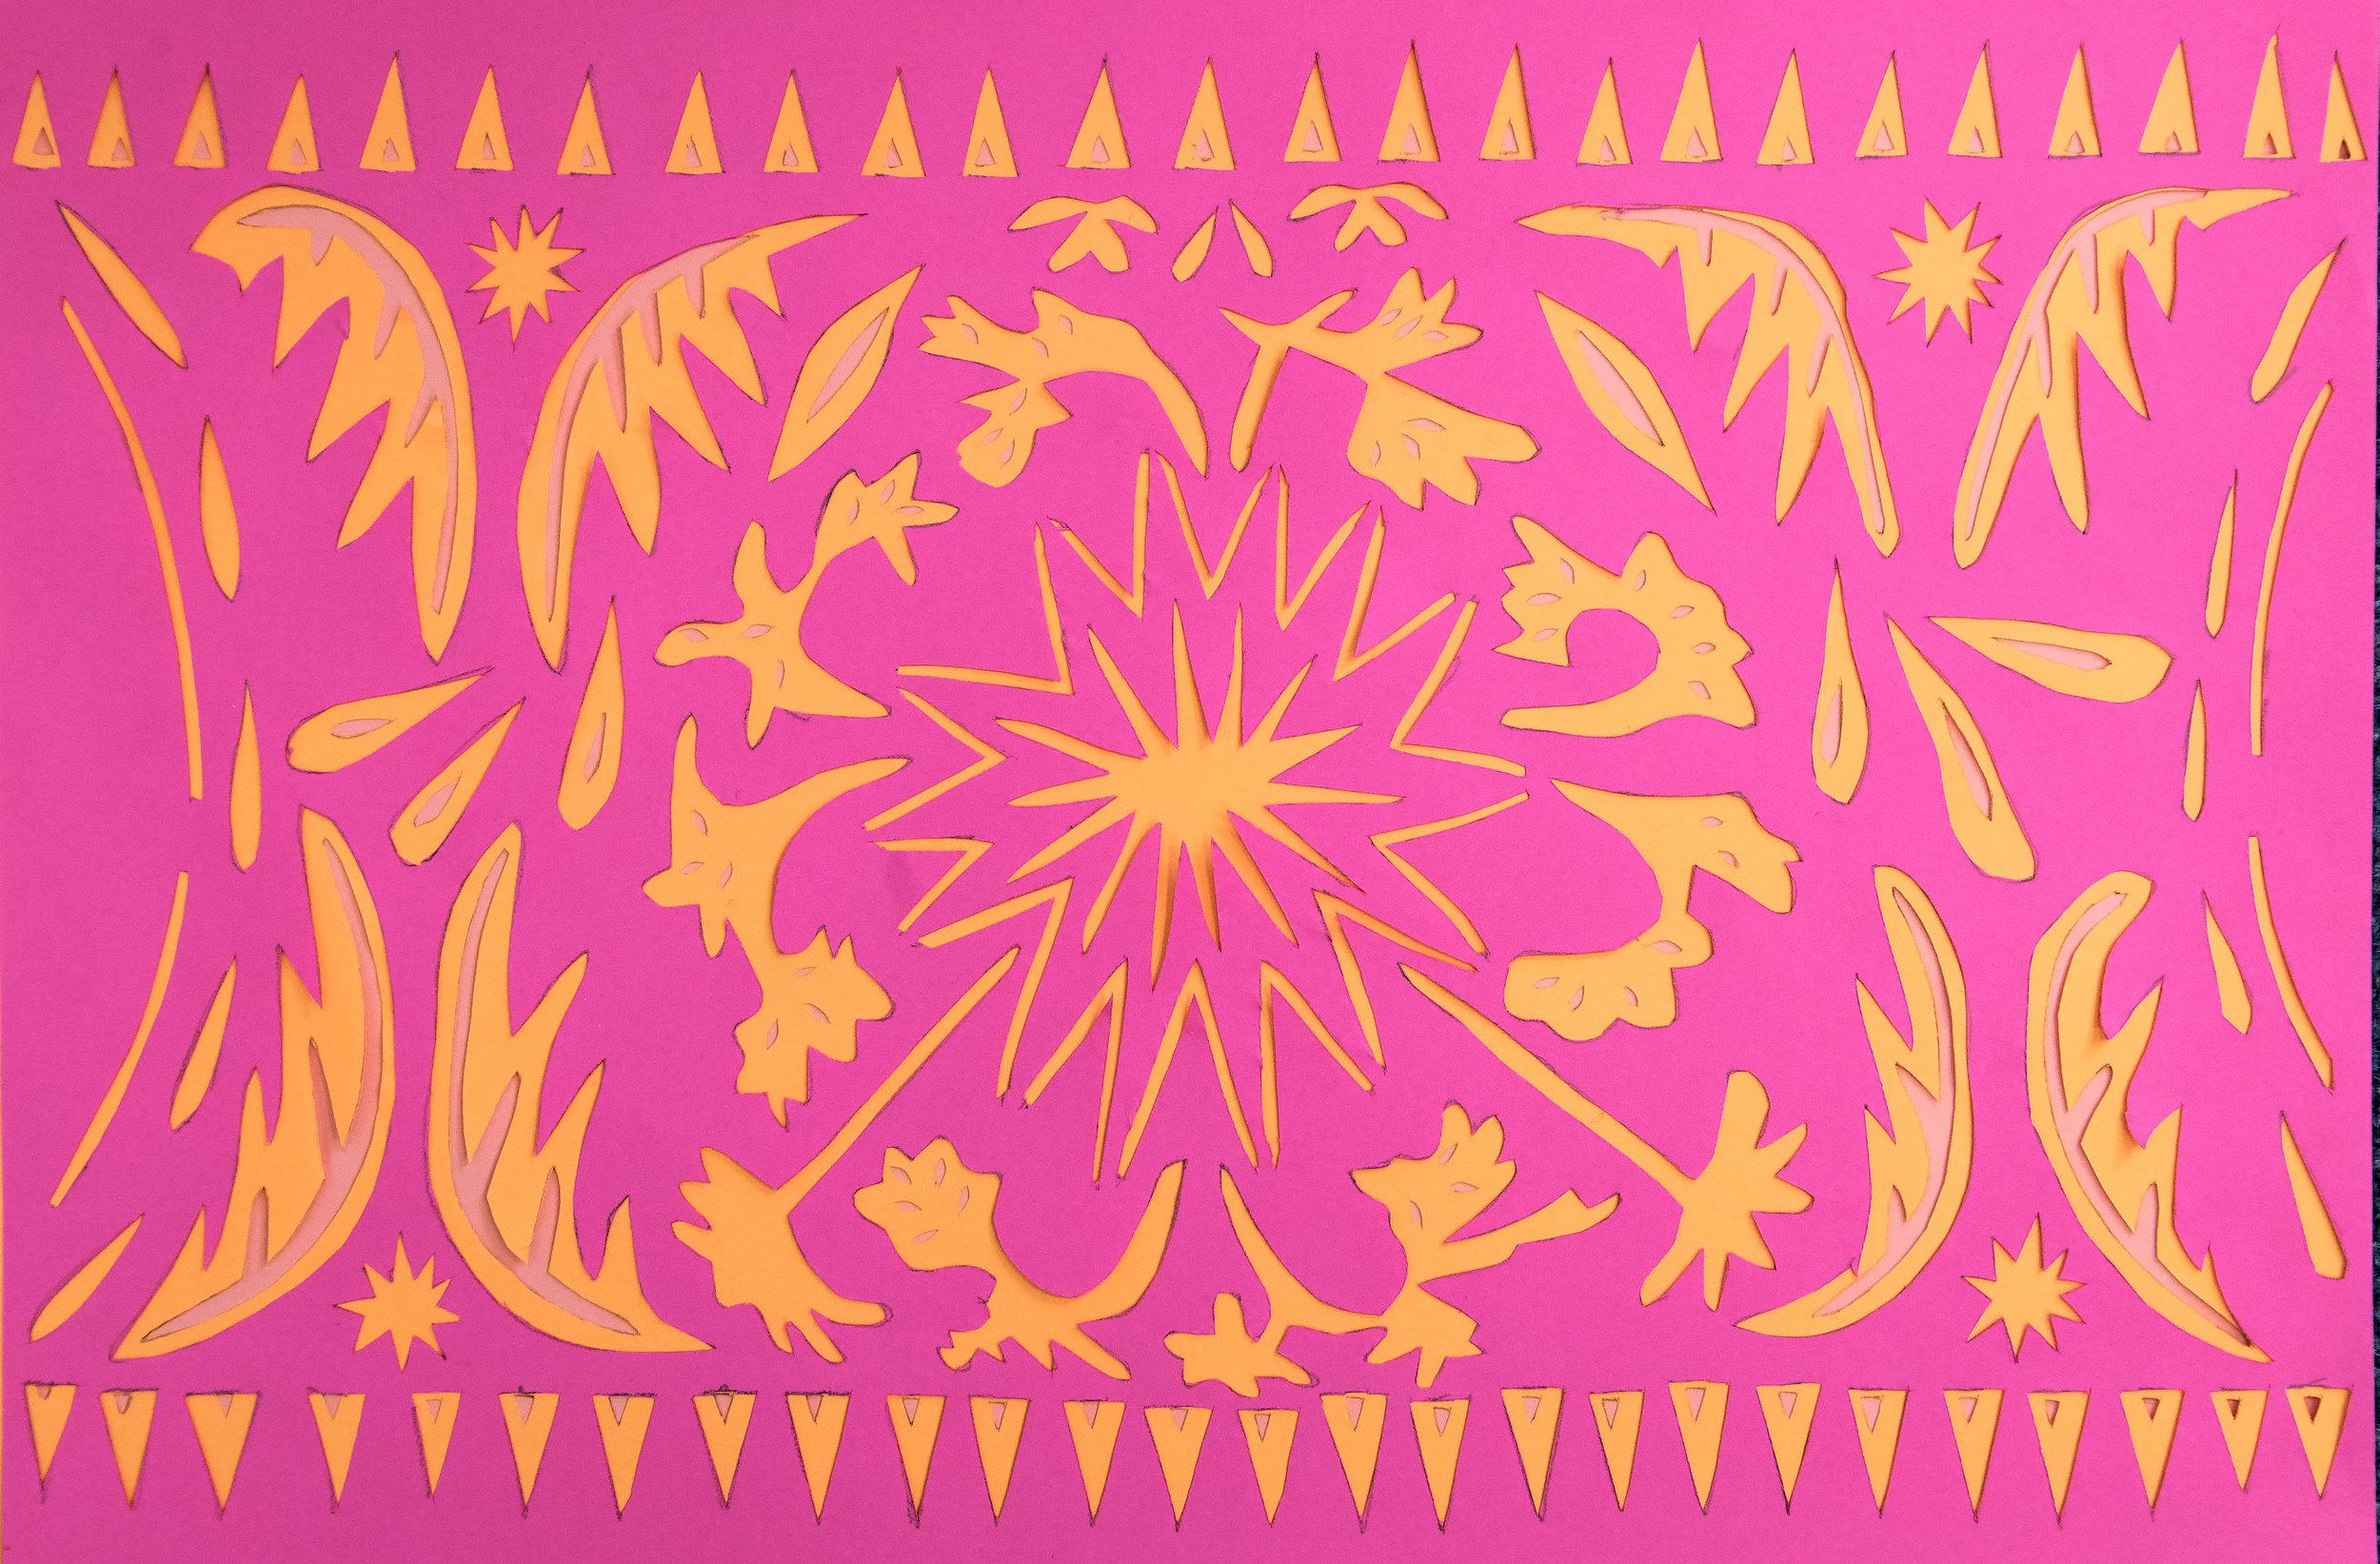 Seasonal Cycle, pink and orange papercut, 21.0 x 29.7cm